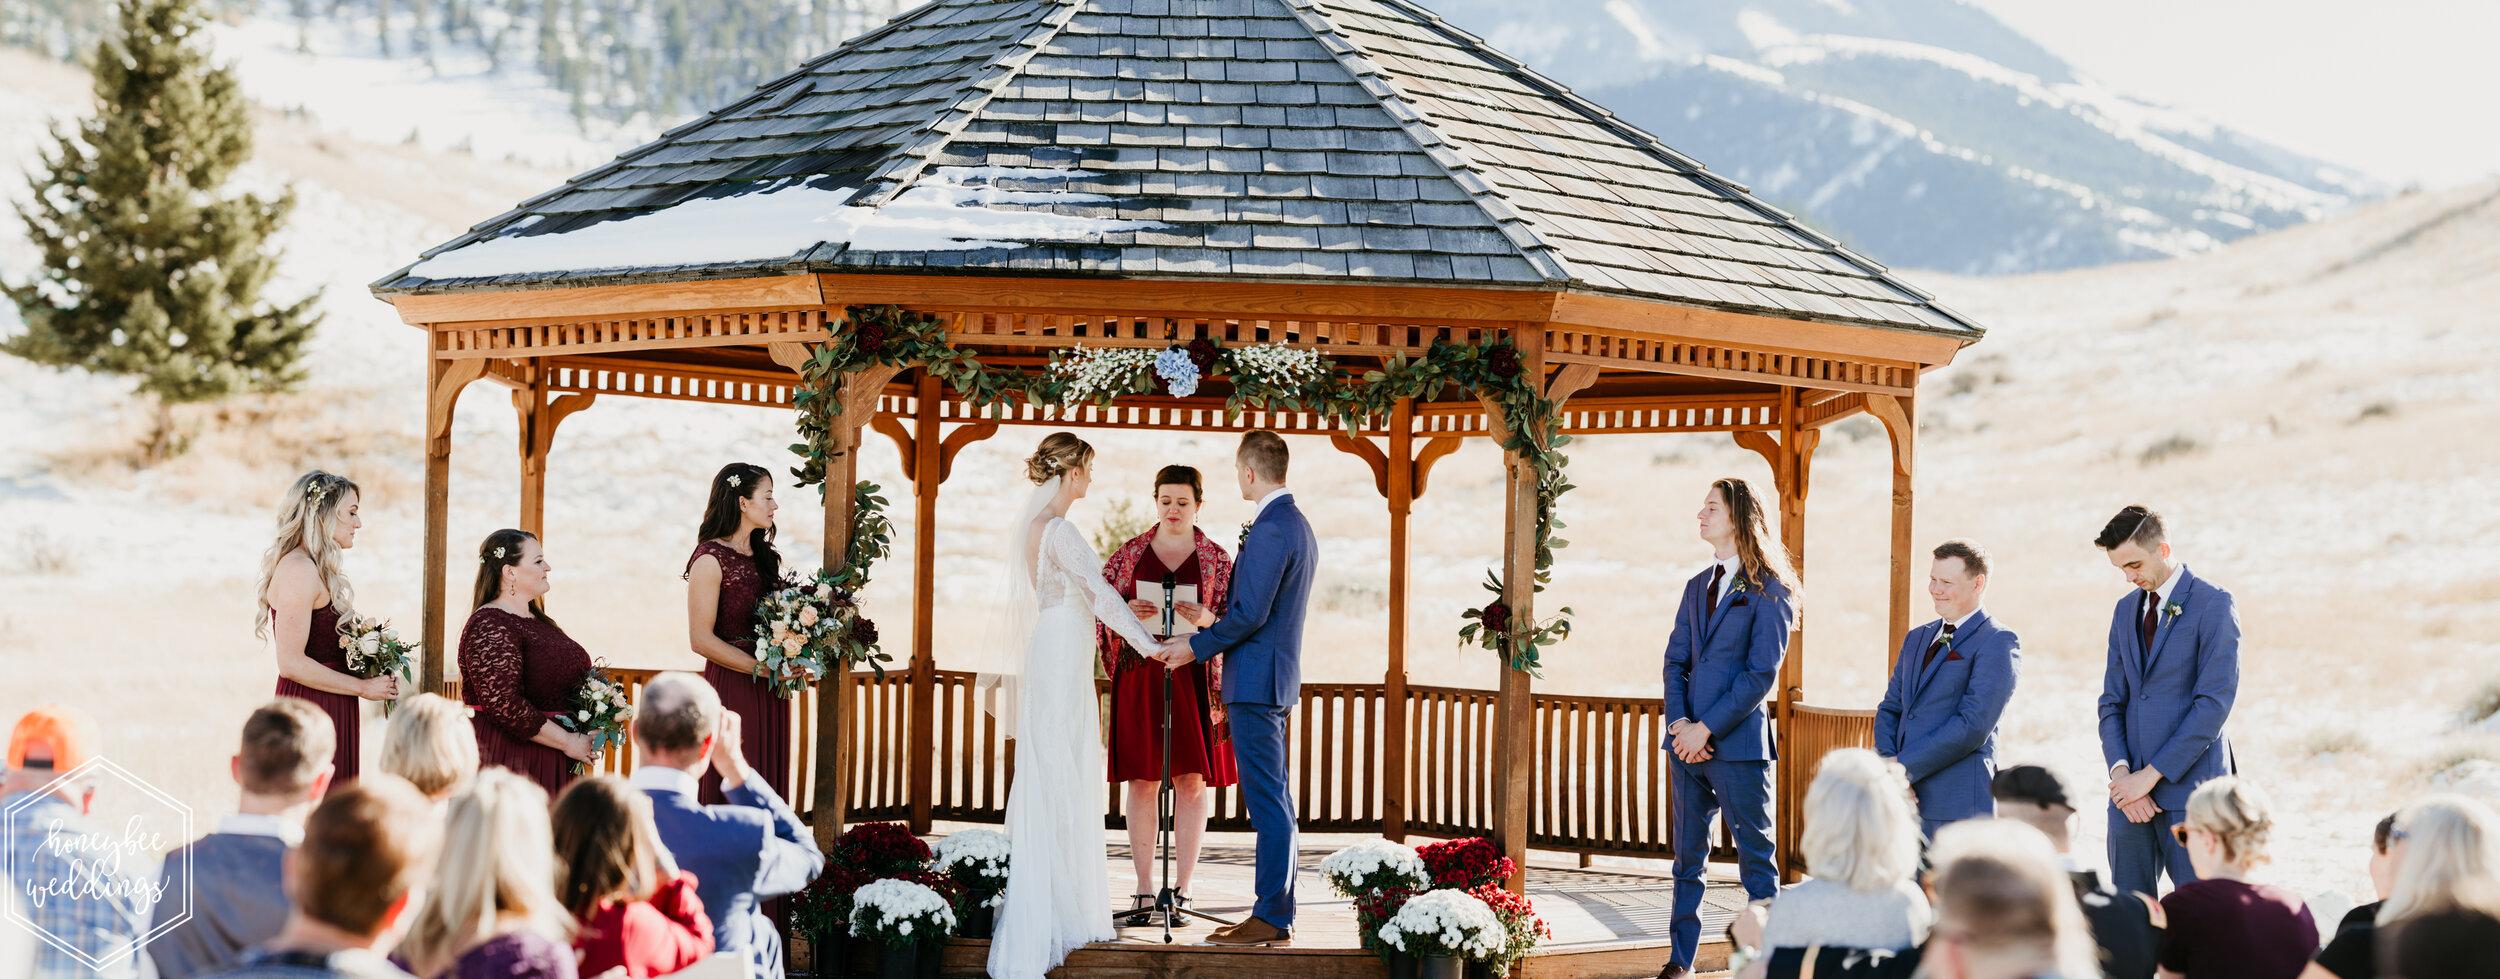 130Chico Hot Springs Wedding_Montana Wedding Photographer_Winter Wedding_Ariel & Richard_October 12, 2019-454-Pano.jpg